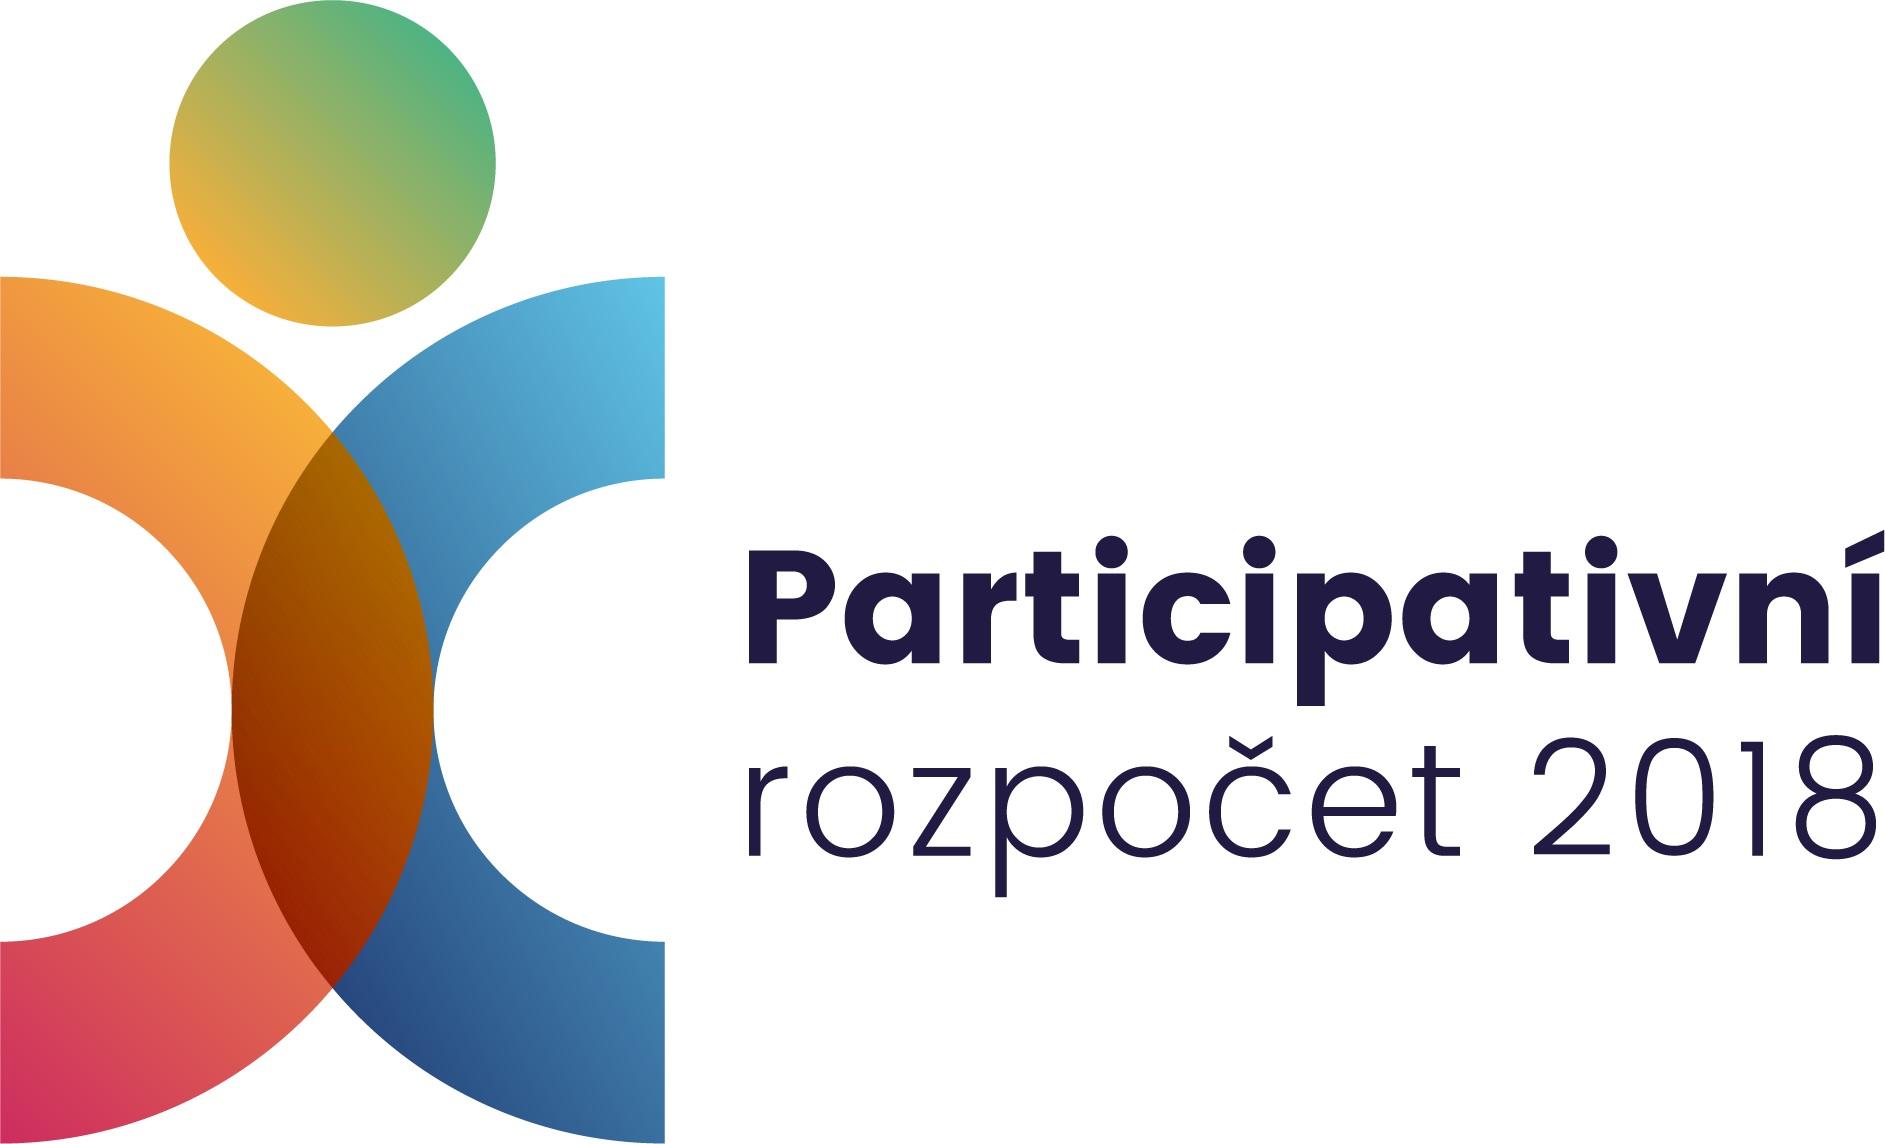 bezpecnost-na-prvnim-miste-participativni-rozpocet-2018